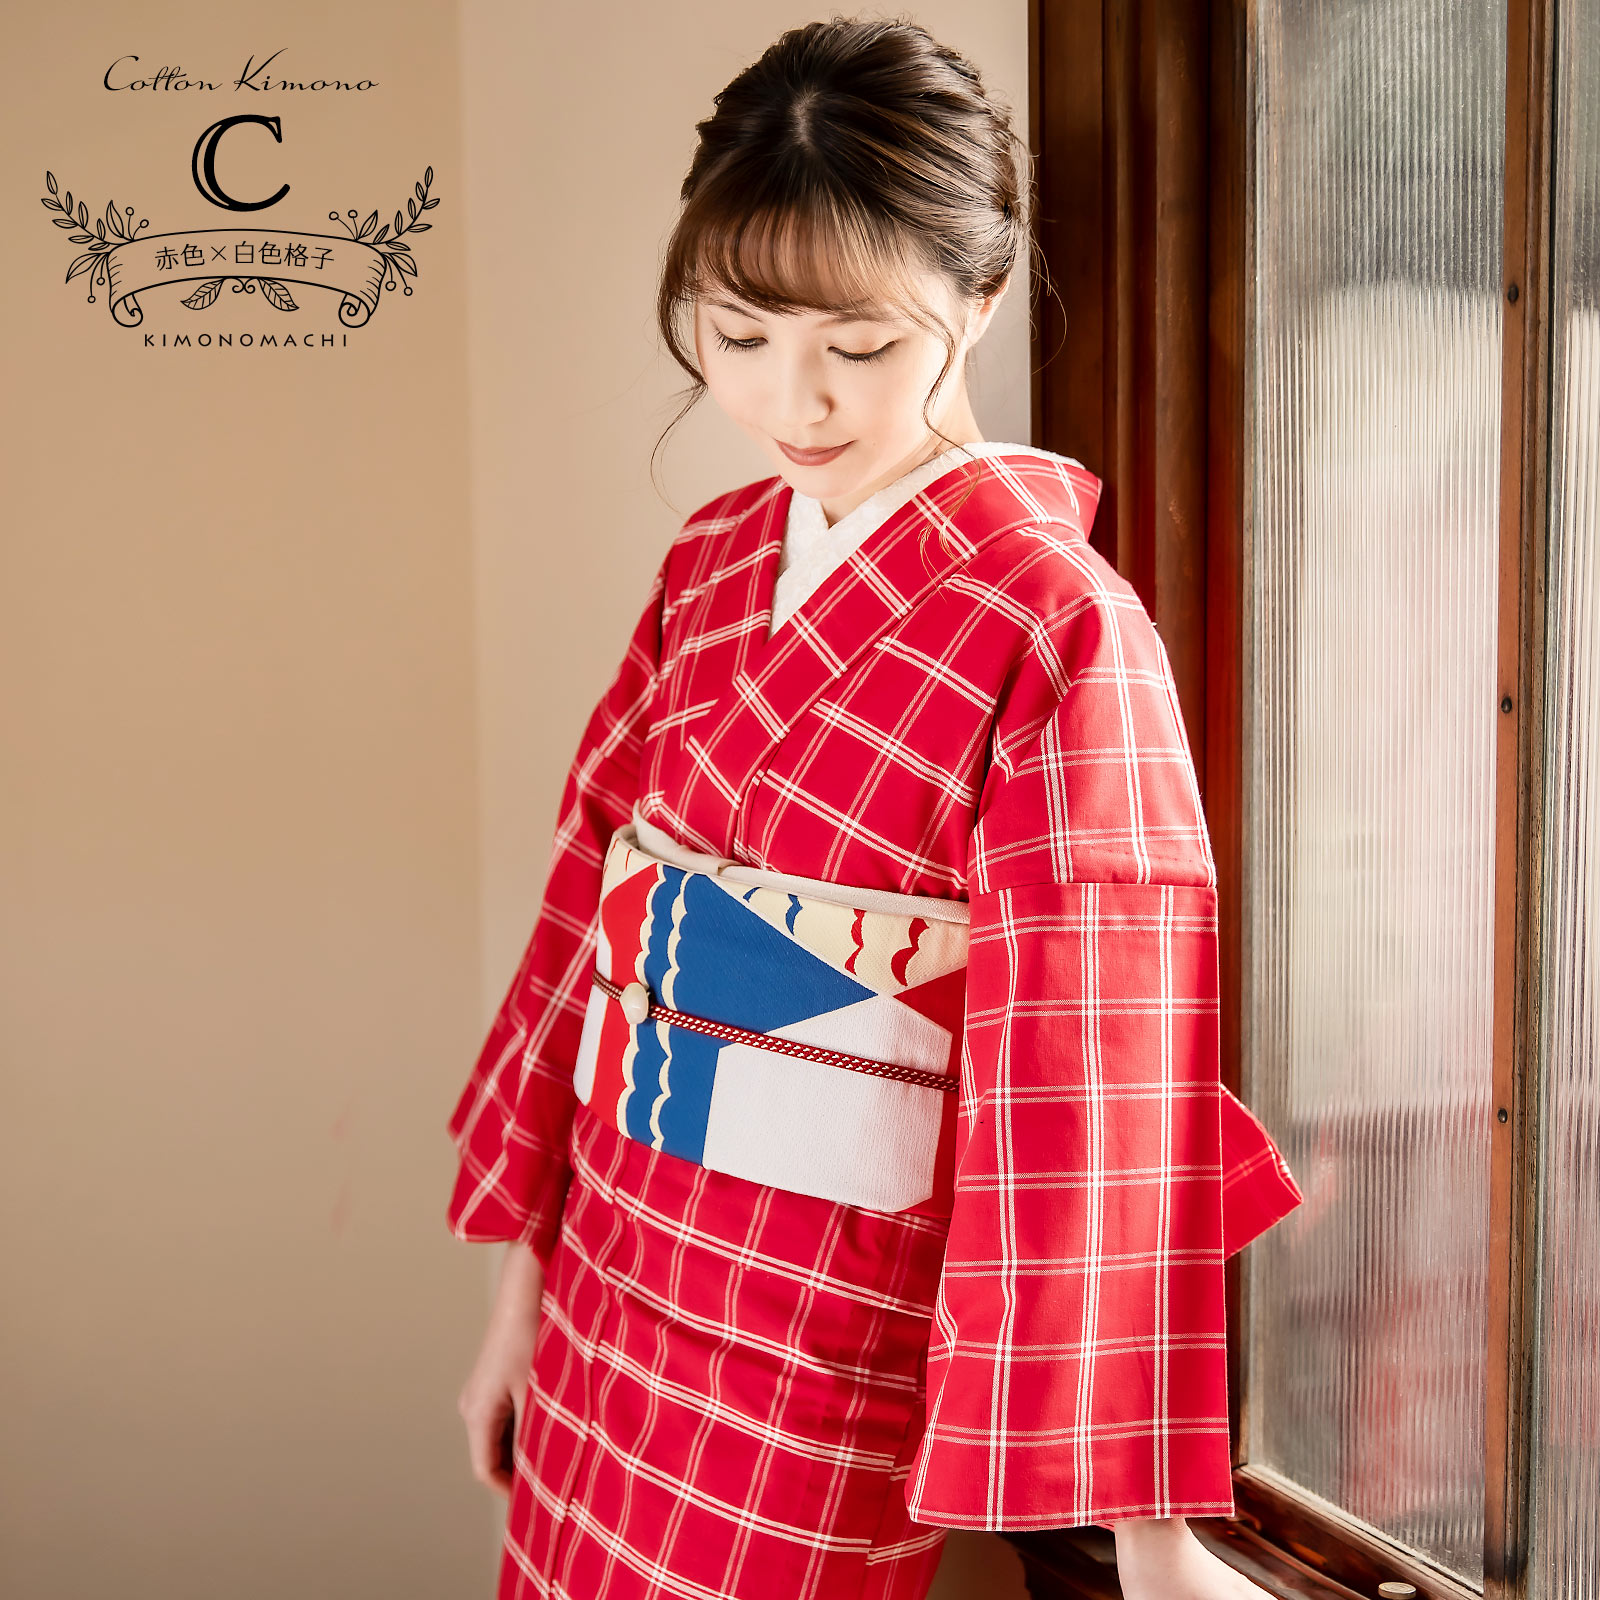 KIMONOMACHI オリジナル 洗える着物 木綿着物単品 07赤色×白色格子